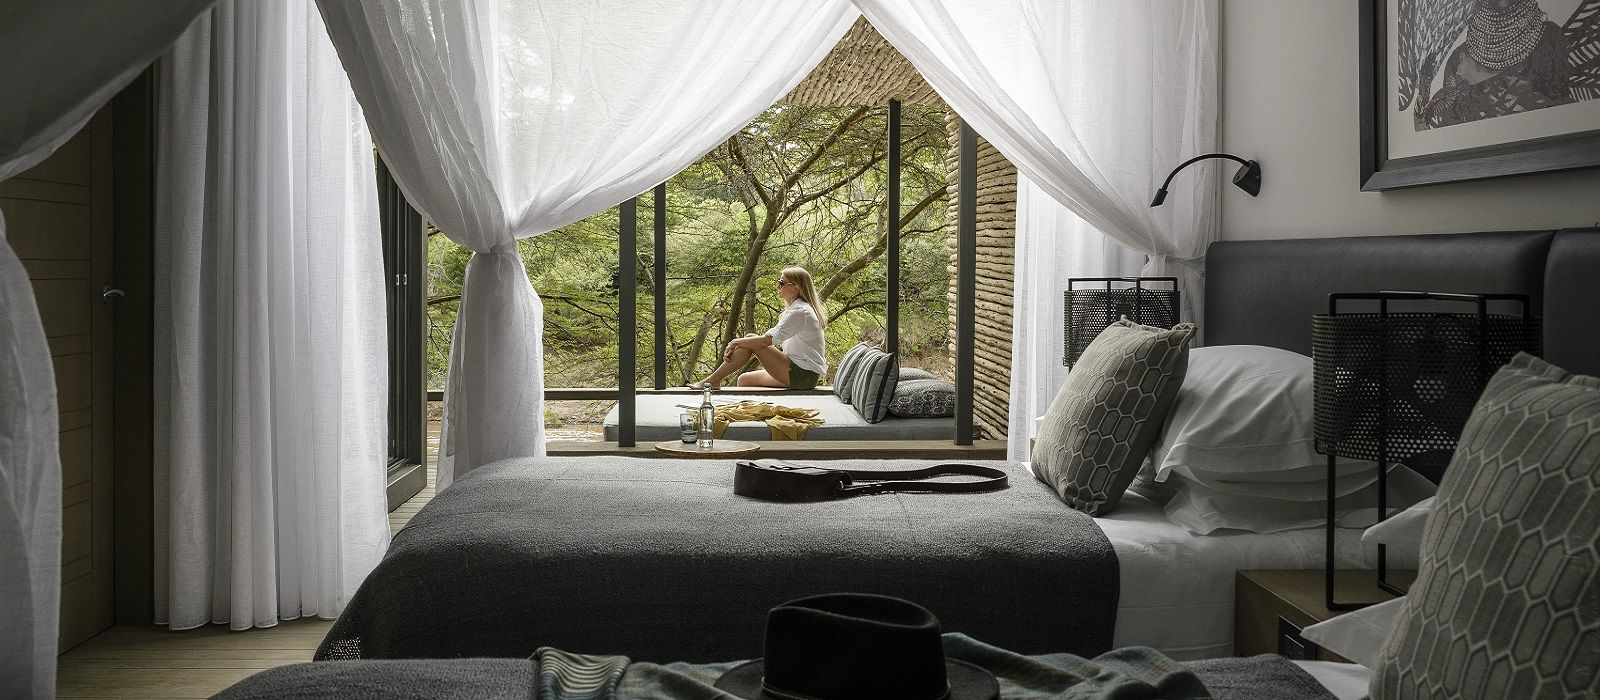 Hotel Sanctuary Olonana Camp Kenya